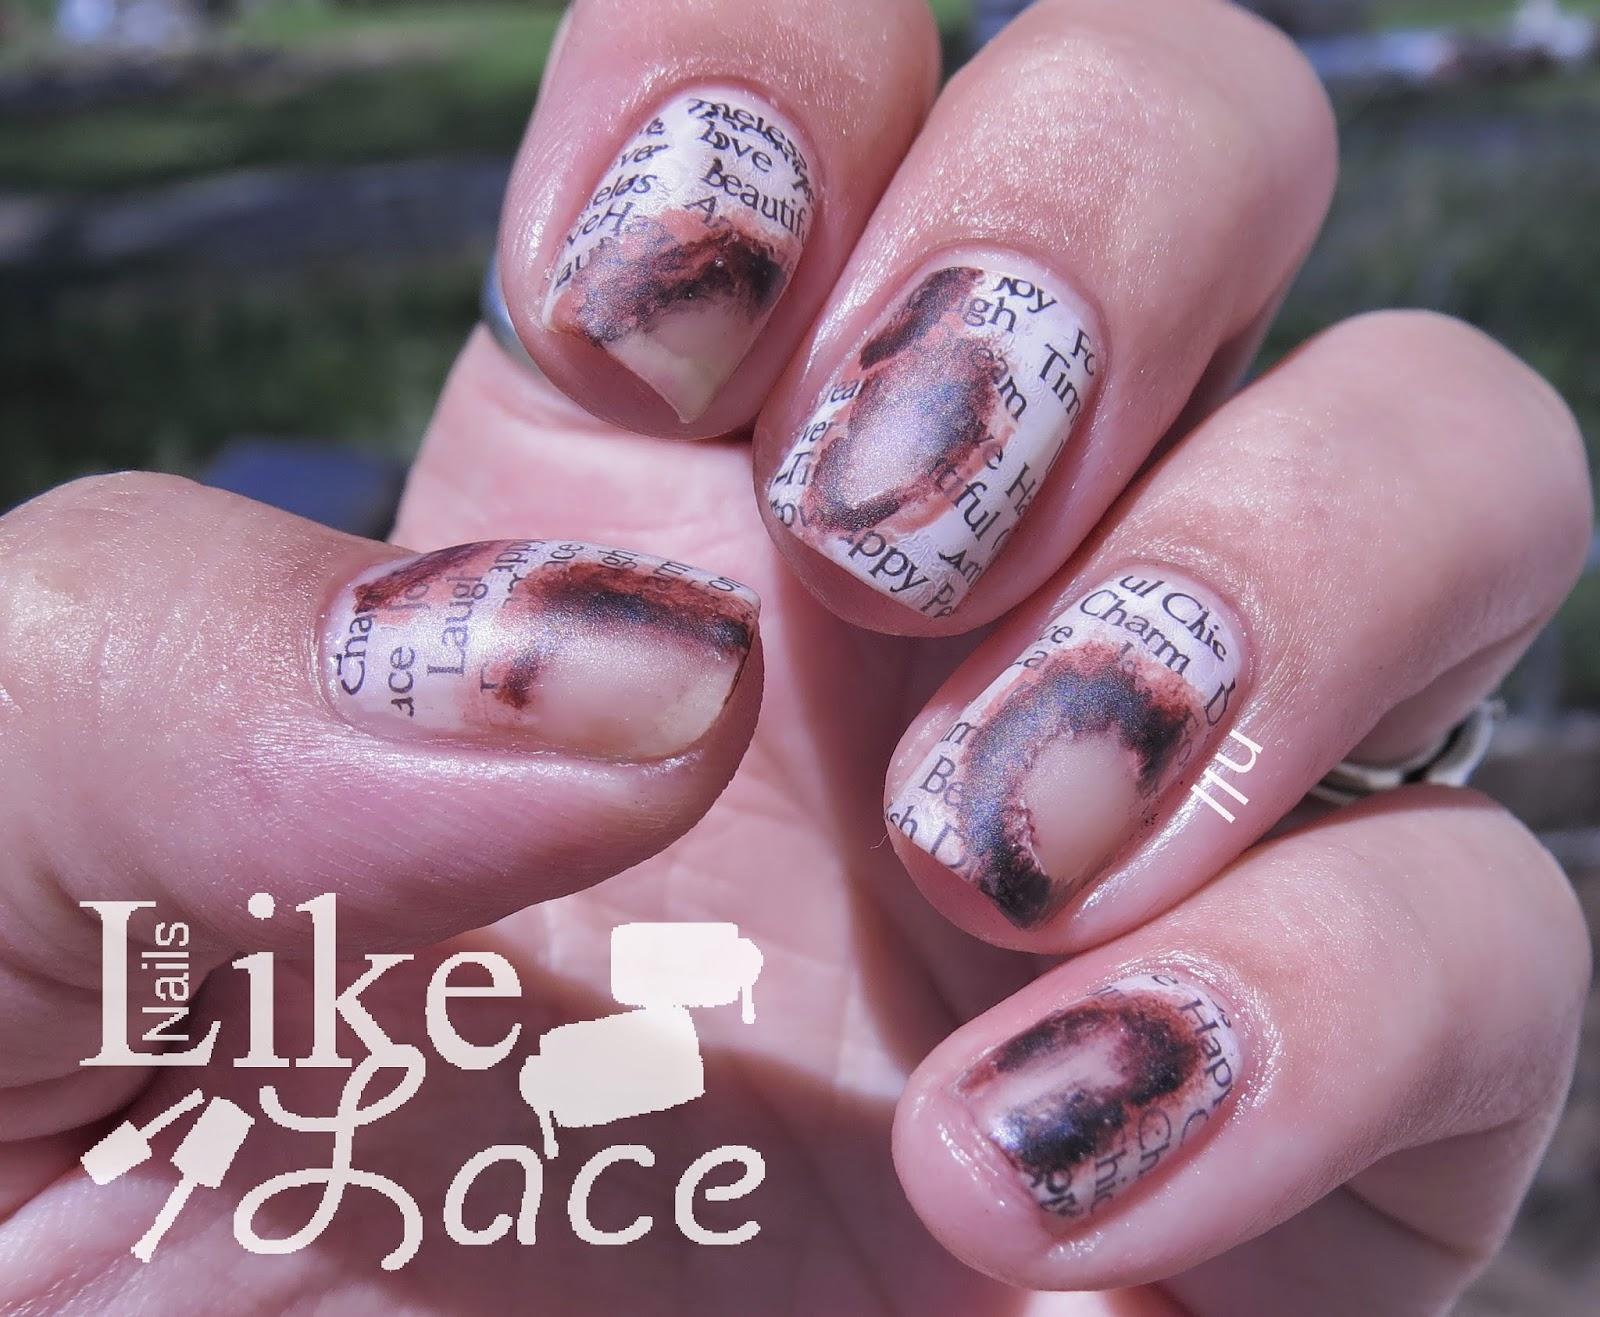 NailsLikeLace: Burnt Newspaper Nails